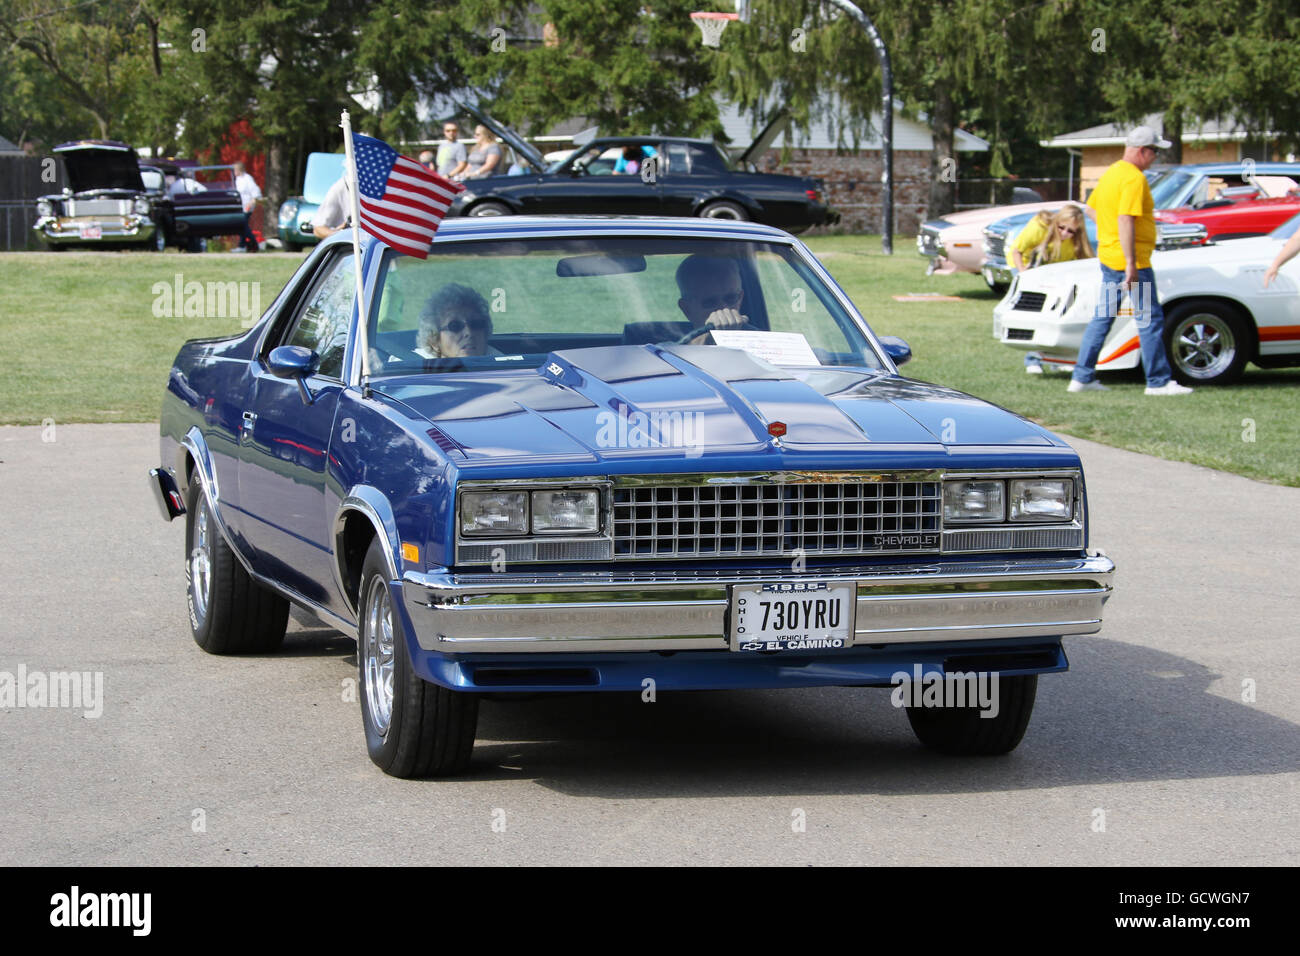 hight resolution of auto 1985 chevrolet el camino 350 beavercreek popcorn festival beavercreek dayton ohio usa 730yru